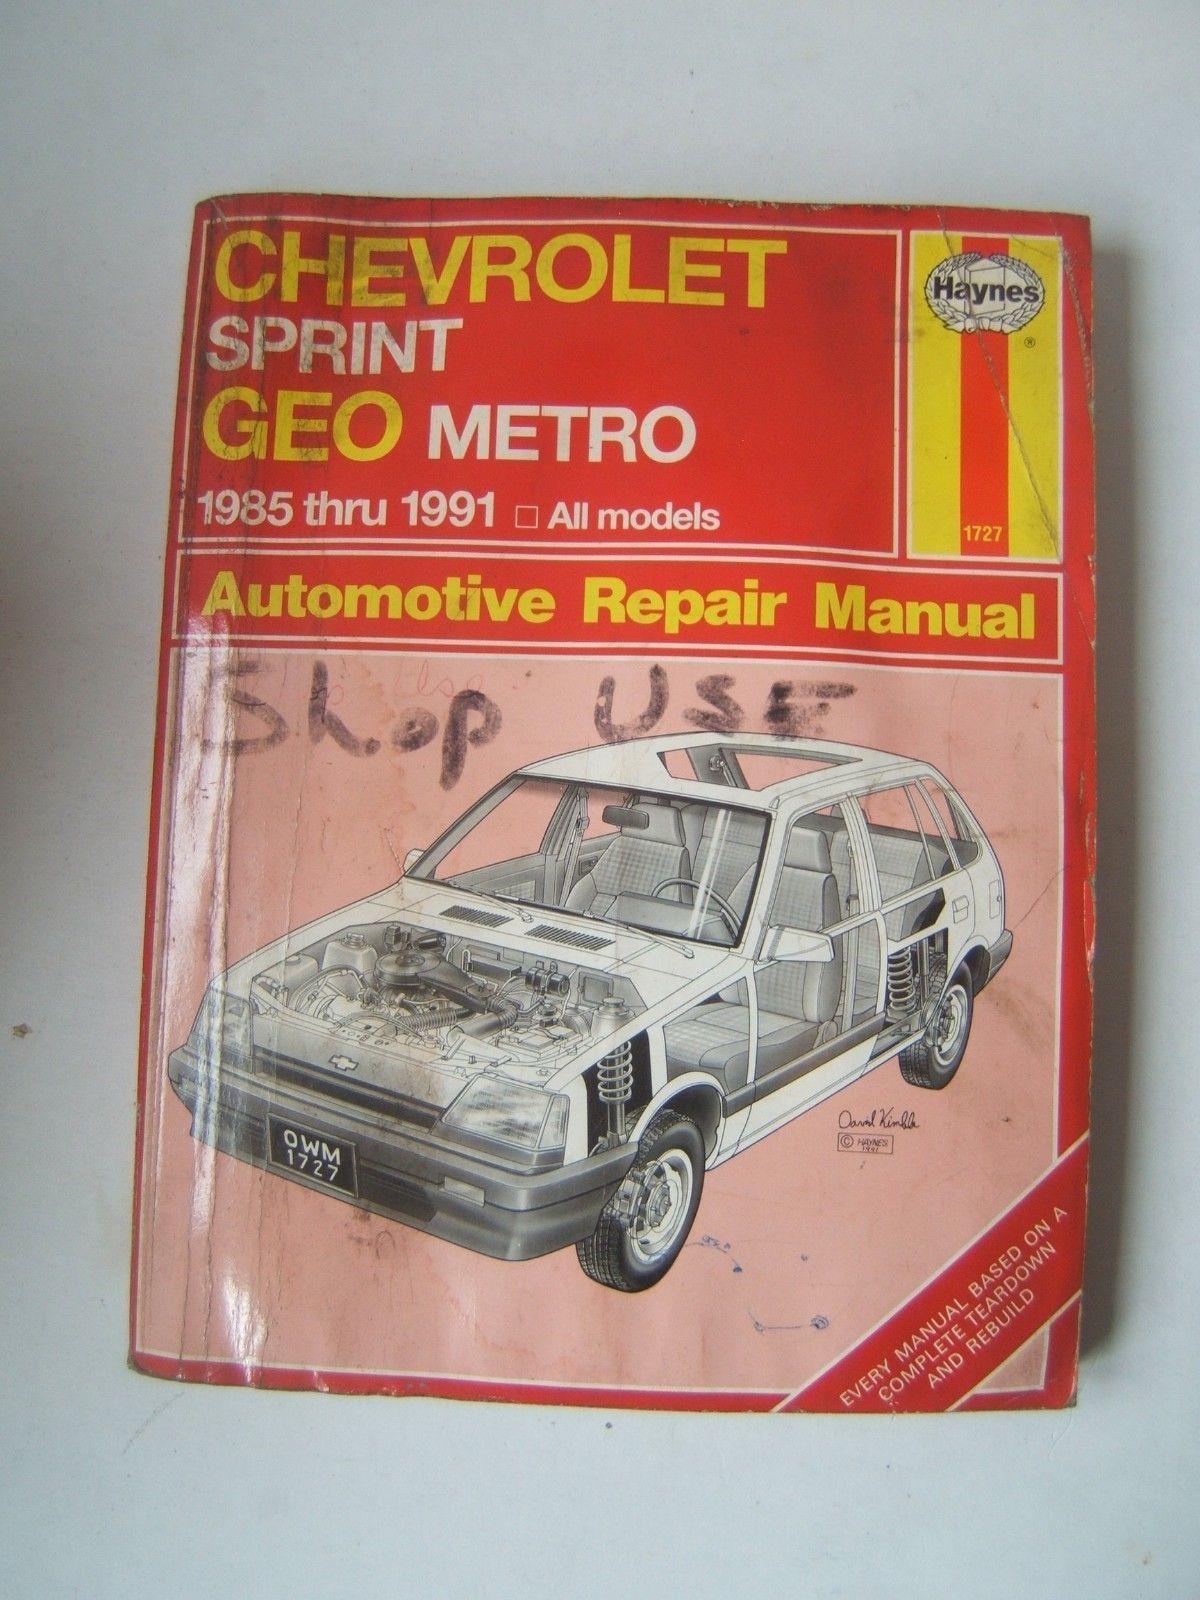 chevrolet sprint geo metro haynes repair and 13 similar items rh bonanza com Haynes Manuals for 2003 Jeep Haynes Manuals UK